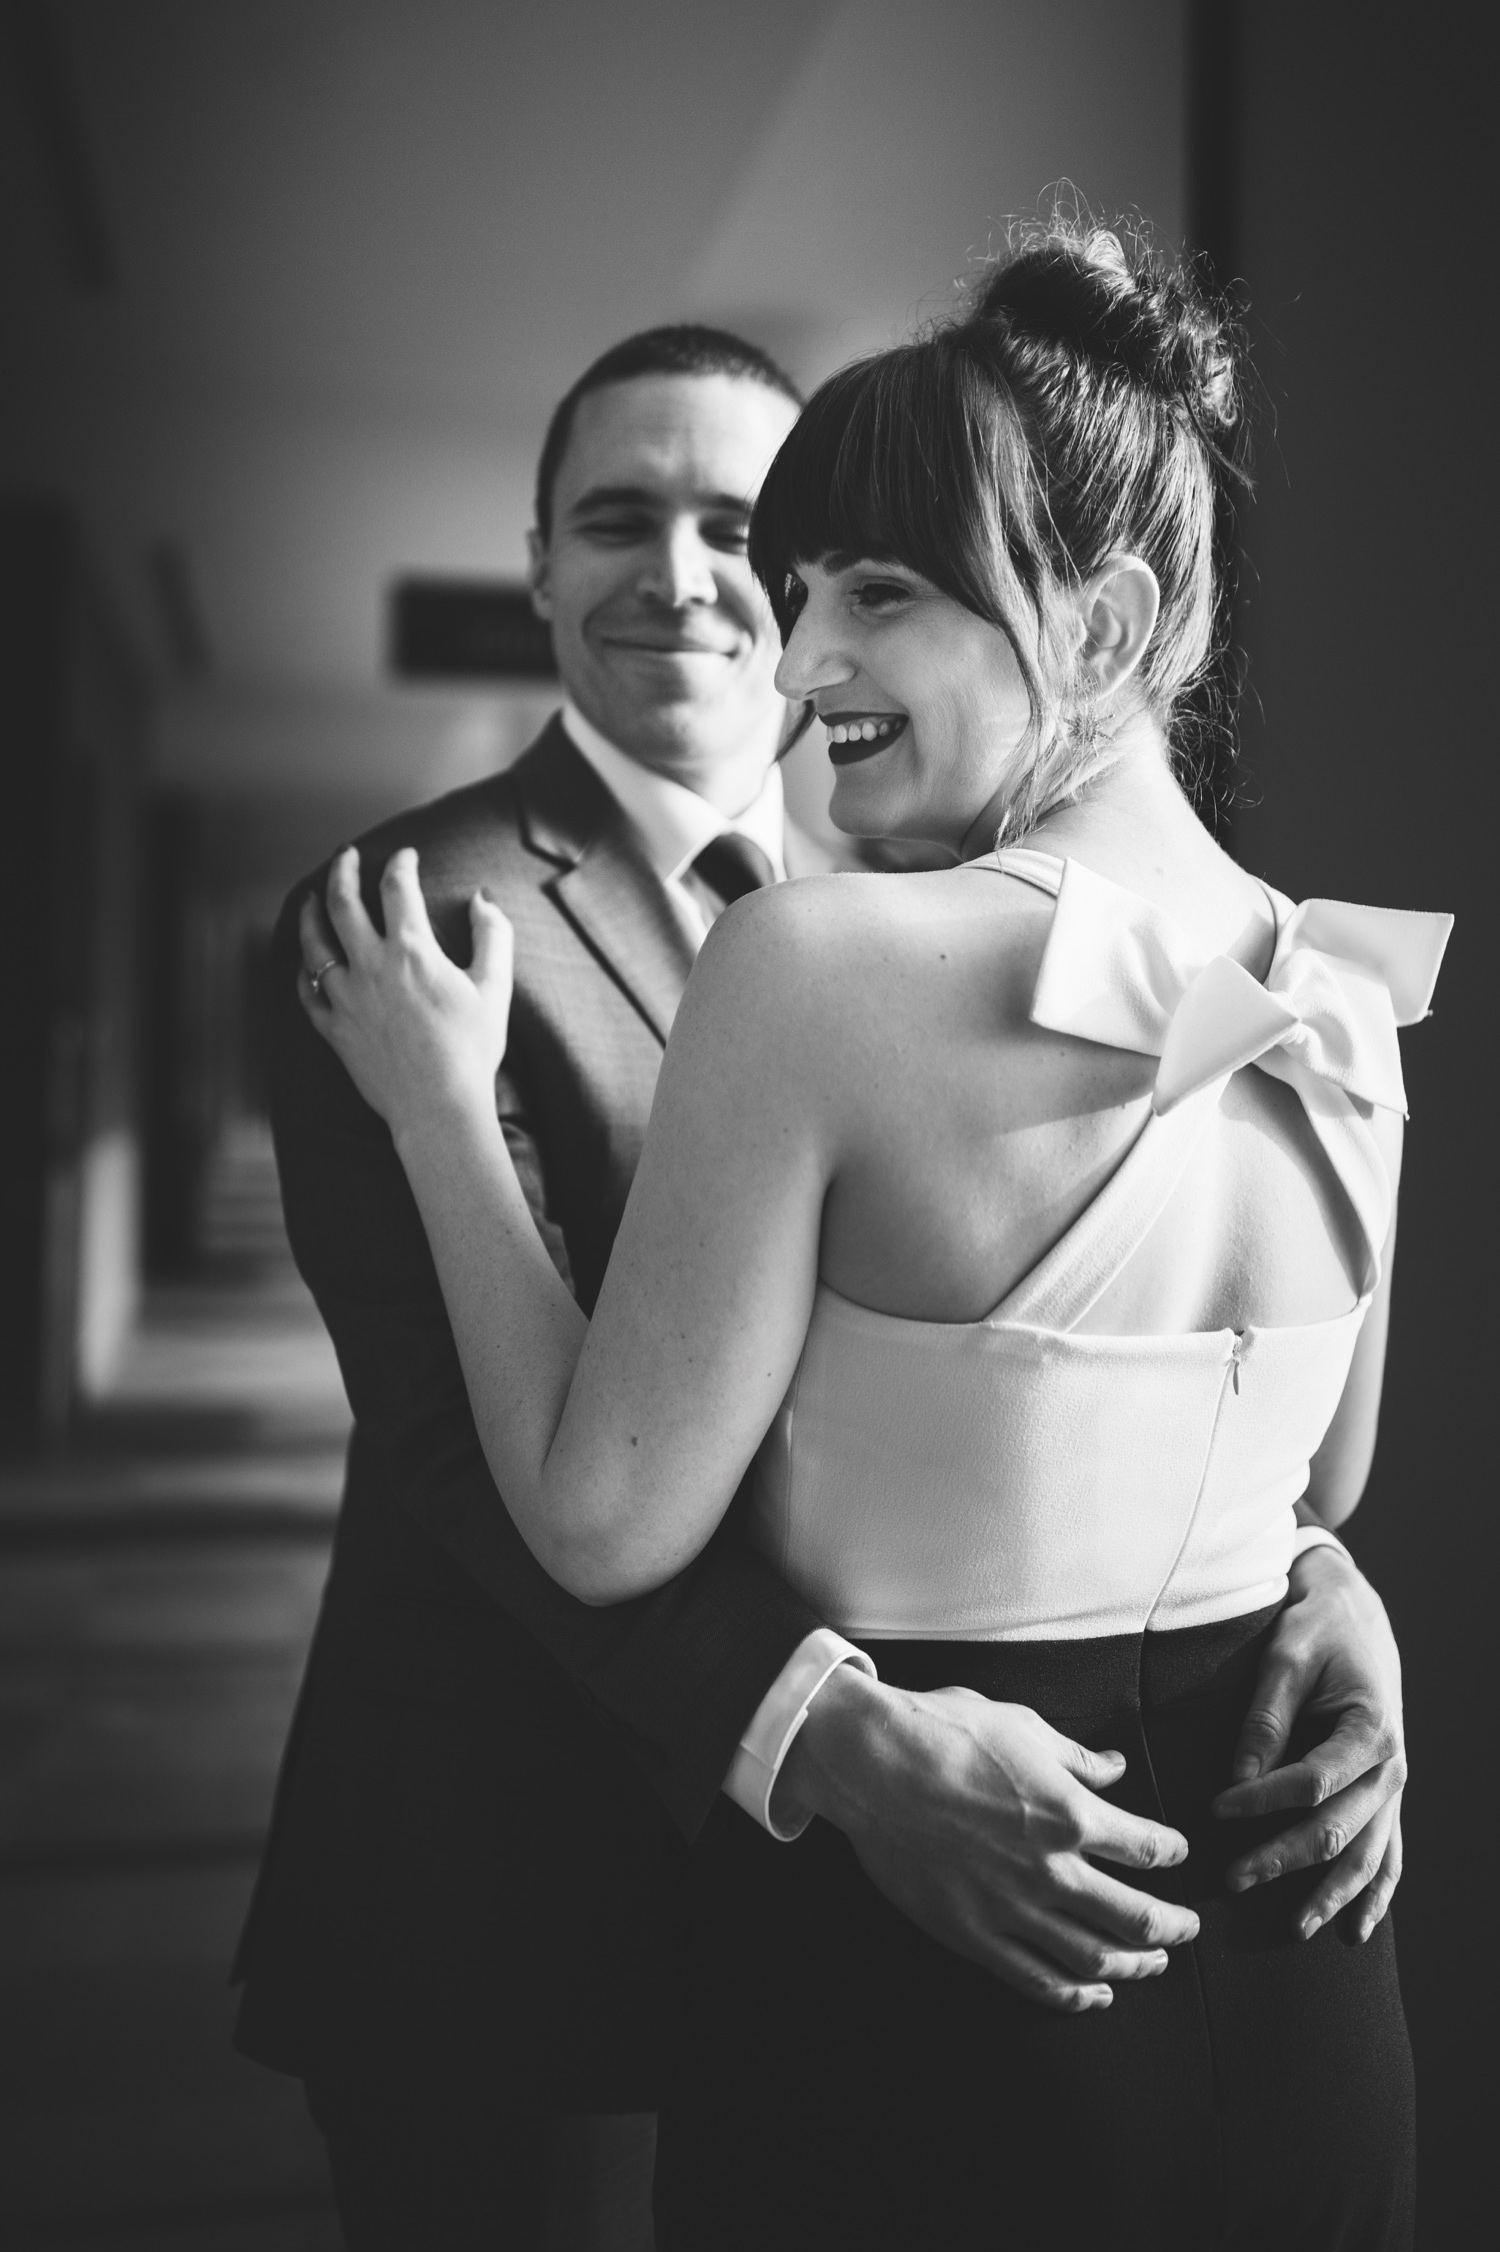 24_SK-98_courthouse_zoe_washingtonelopement_elopement_zoeburchardstudio_seattlebride_washington_stylish_burchard_elopementphotographer_downtown_jumpsuit_seattle_weddingjumpsuit_wedding_stylishwedding.jpg